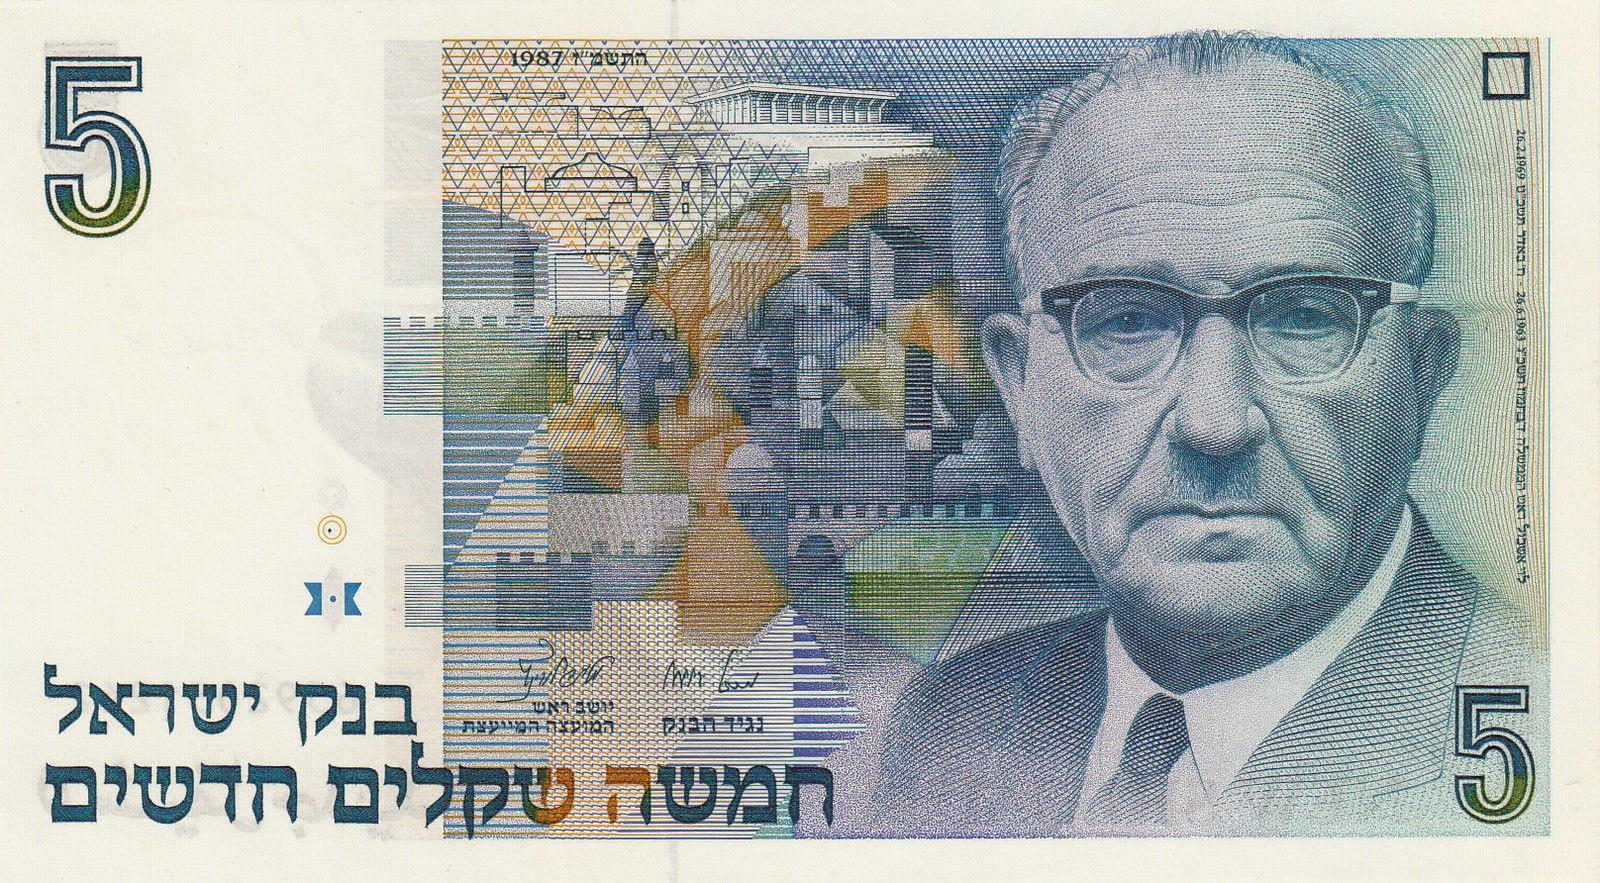 Israel banknotes 5 New Shekel note 1987 Levi Eshkol